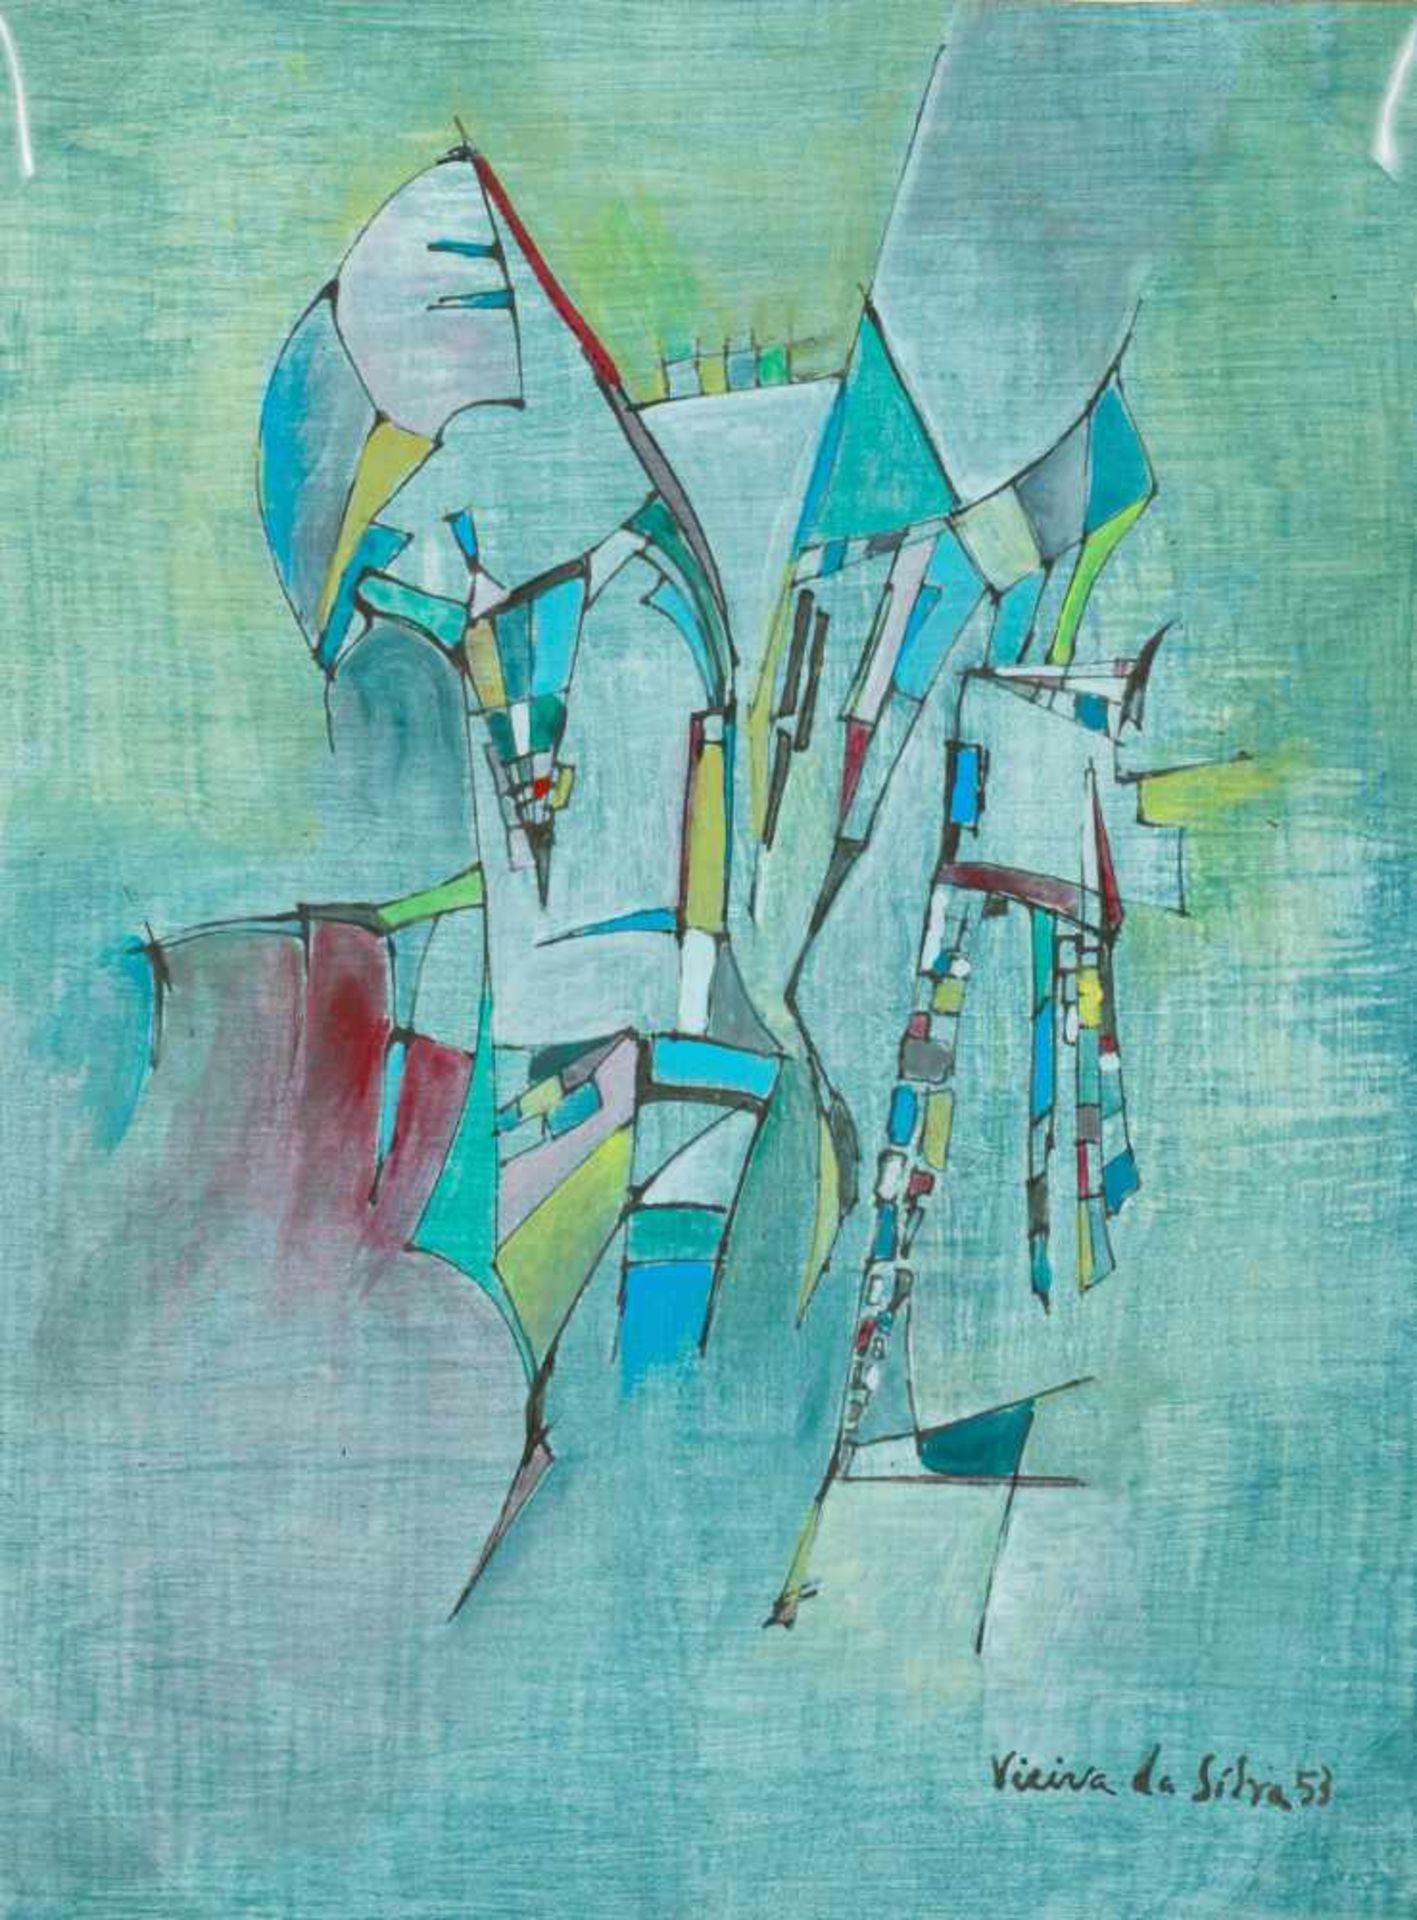 Los 3 - Maria Elena Vieira da Silva Lissabon 1908 - 1992 Paris Abstraktion Tempera - Gouache auf Papier